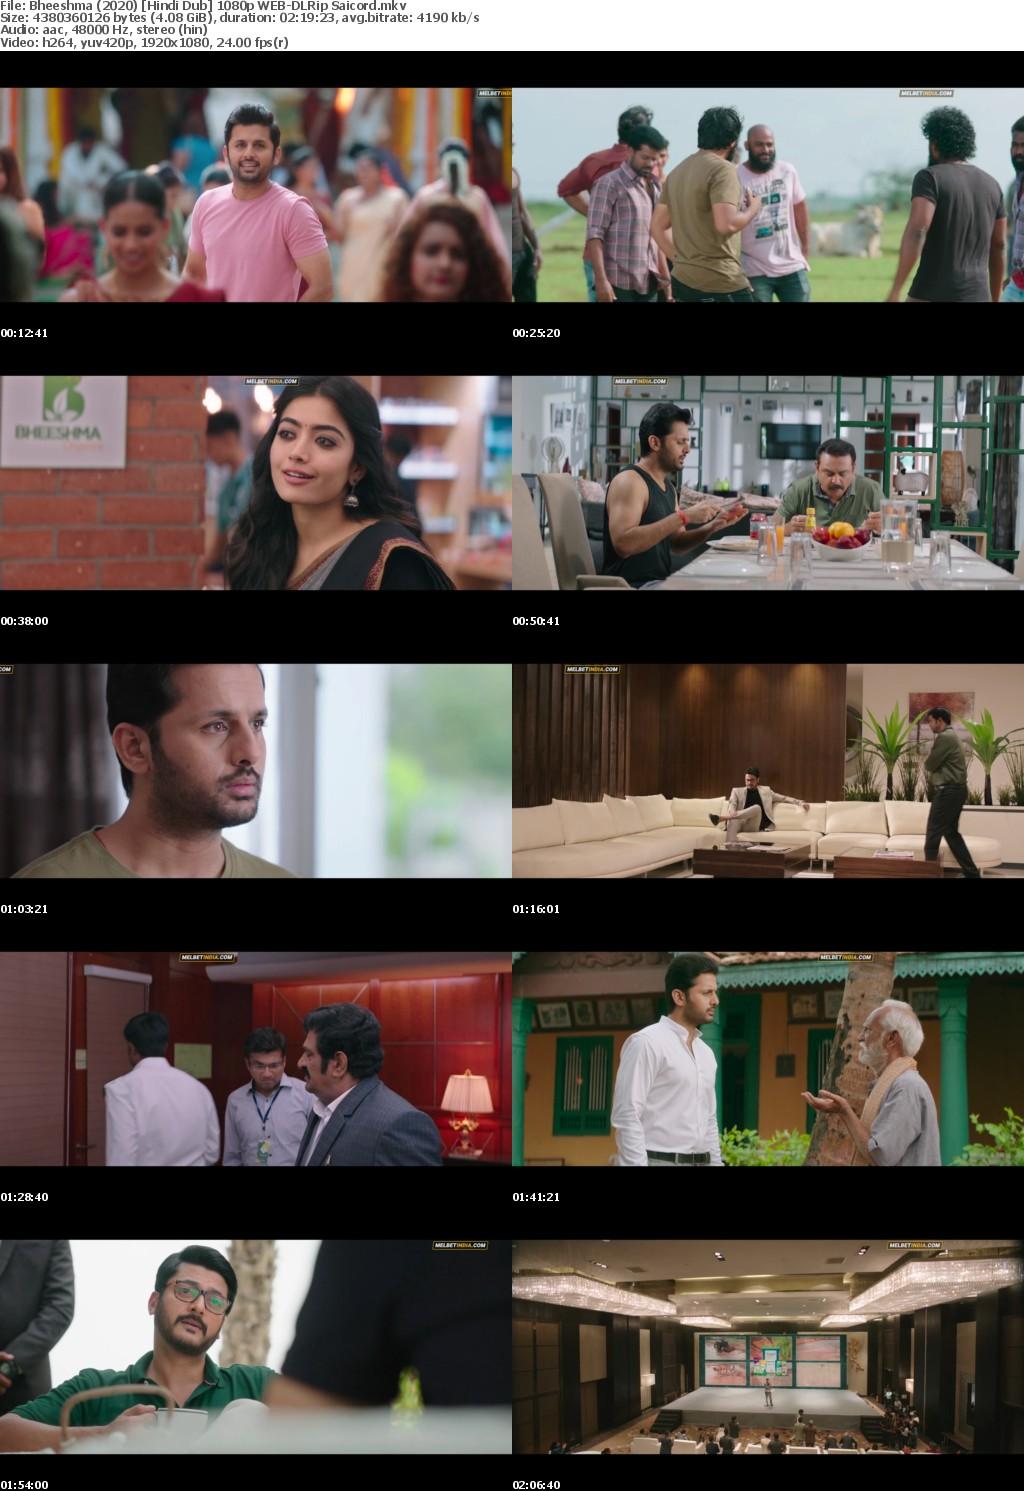 Bheeshma (2020) Hindi Dub 1080p WEB-DLRip Saicord